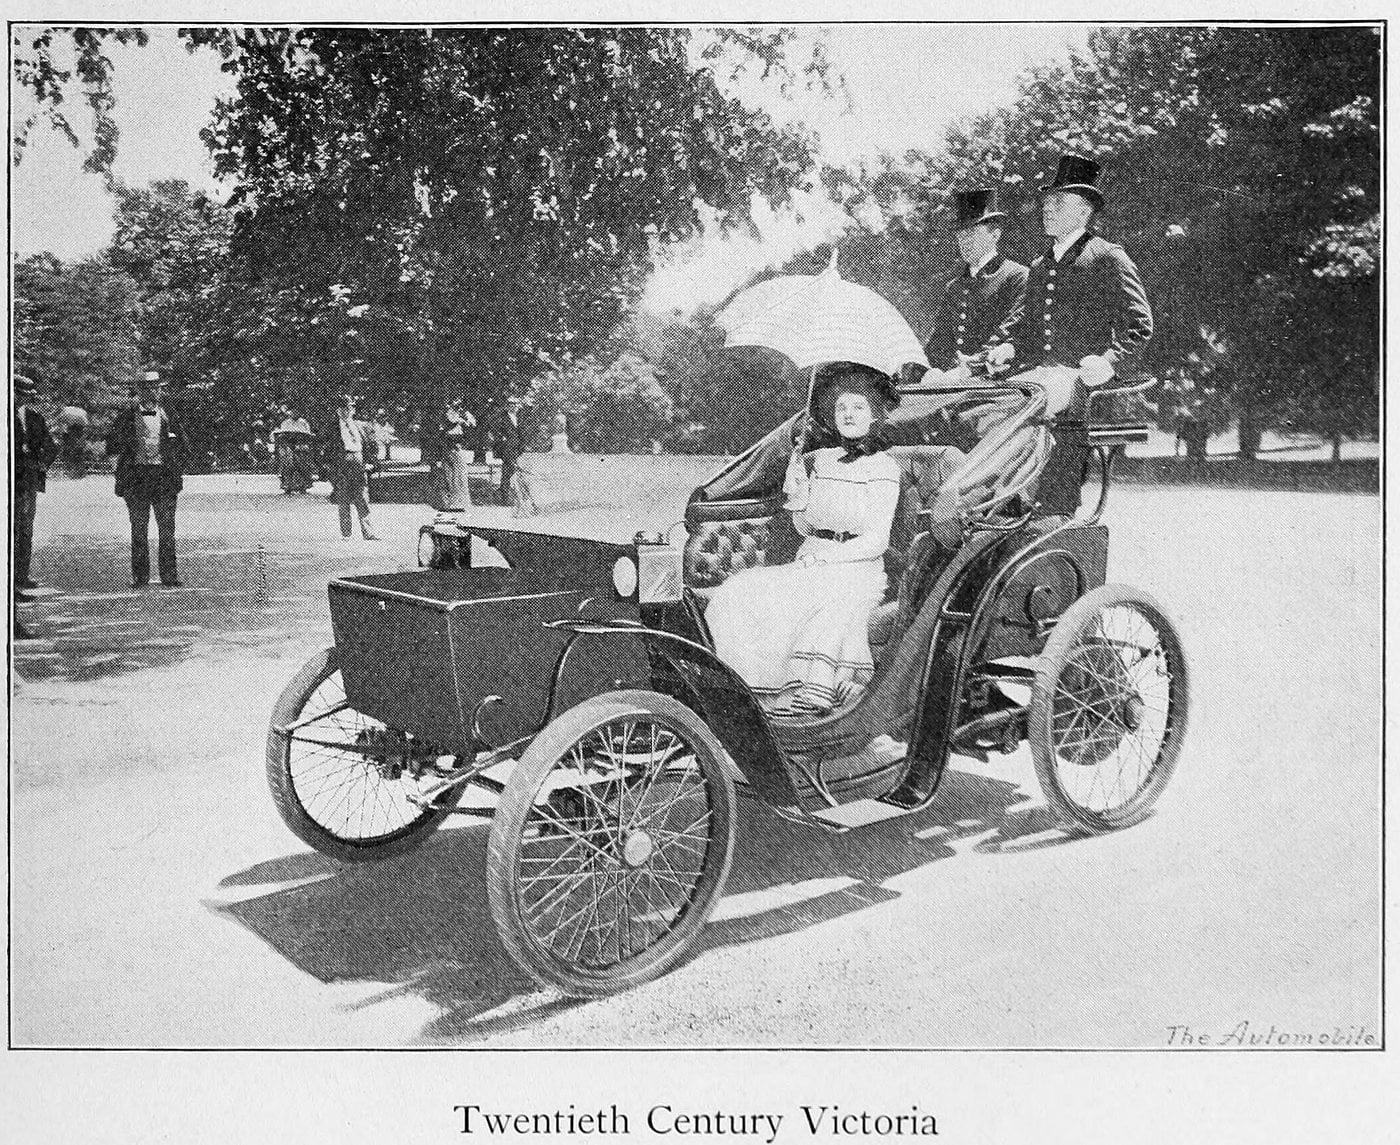 Twentieth Century Victoria (1899)